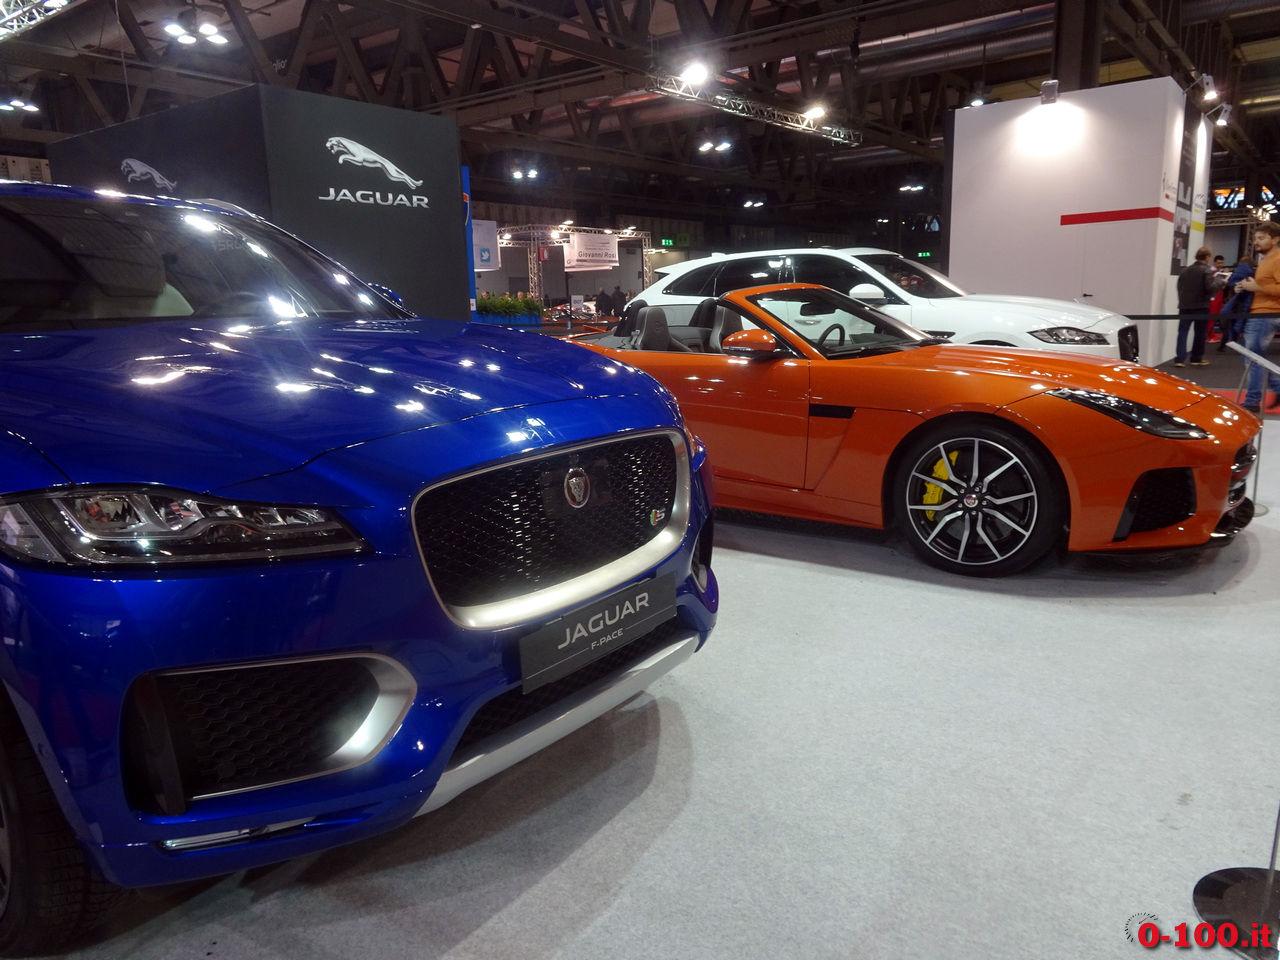 duemila-ruote-milano-autoclassica-rm-sothebys-0-100-jaguar-f-pace_37